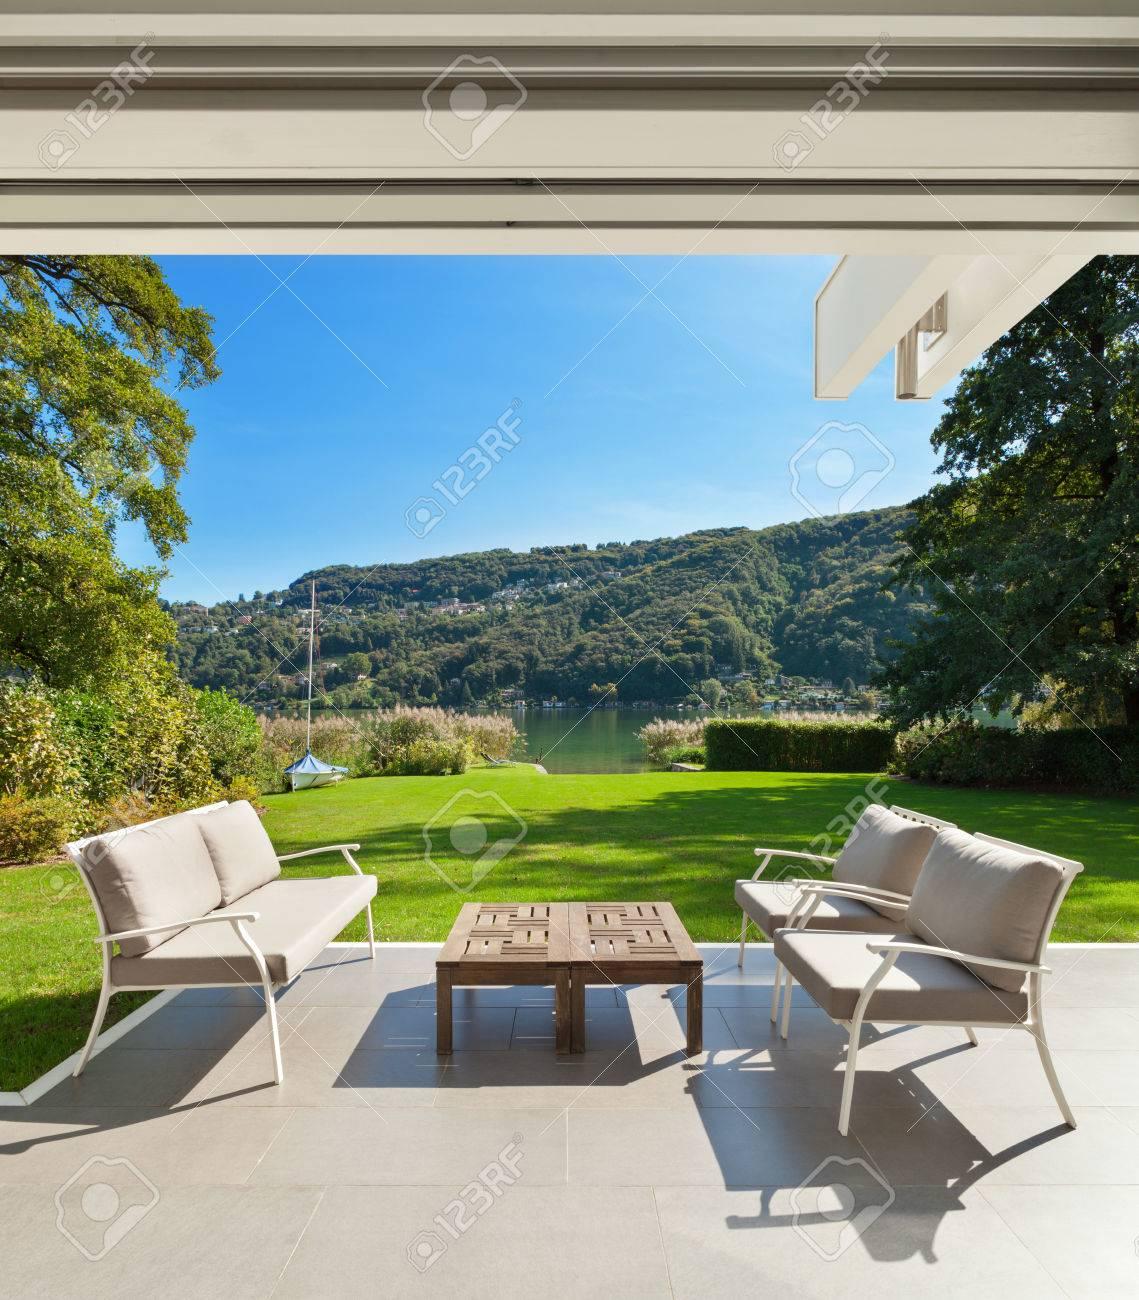 modern house outdoors, beautiful veranda in the garden - 49781324